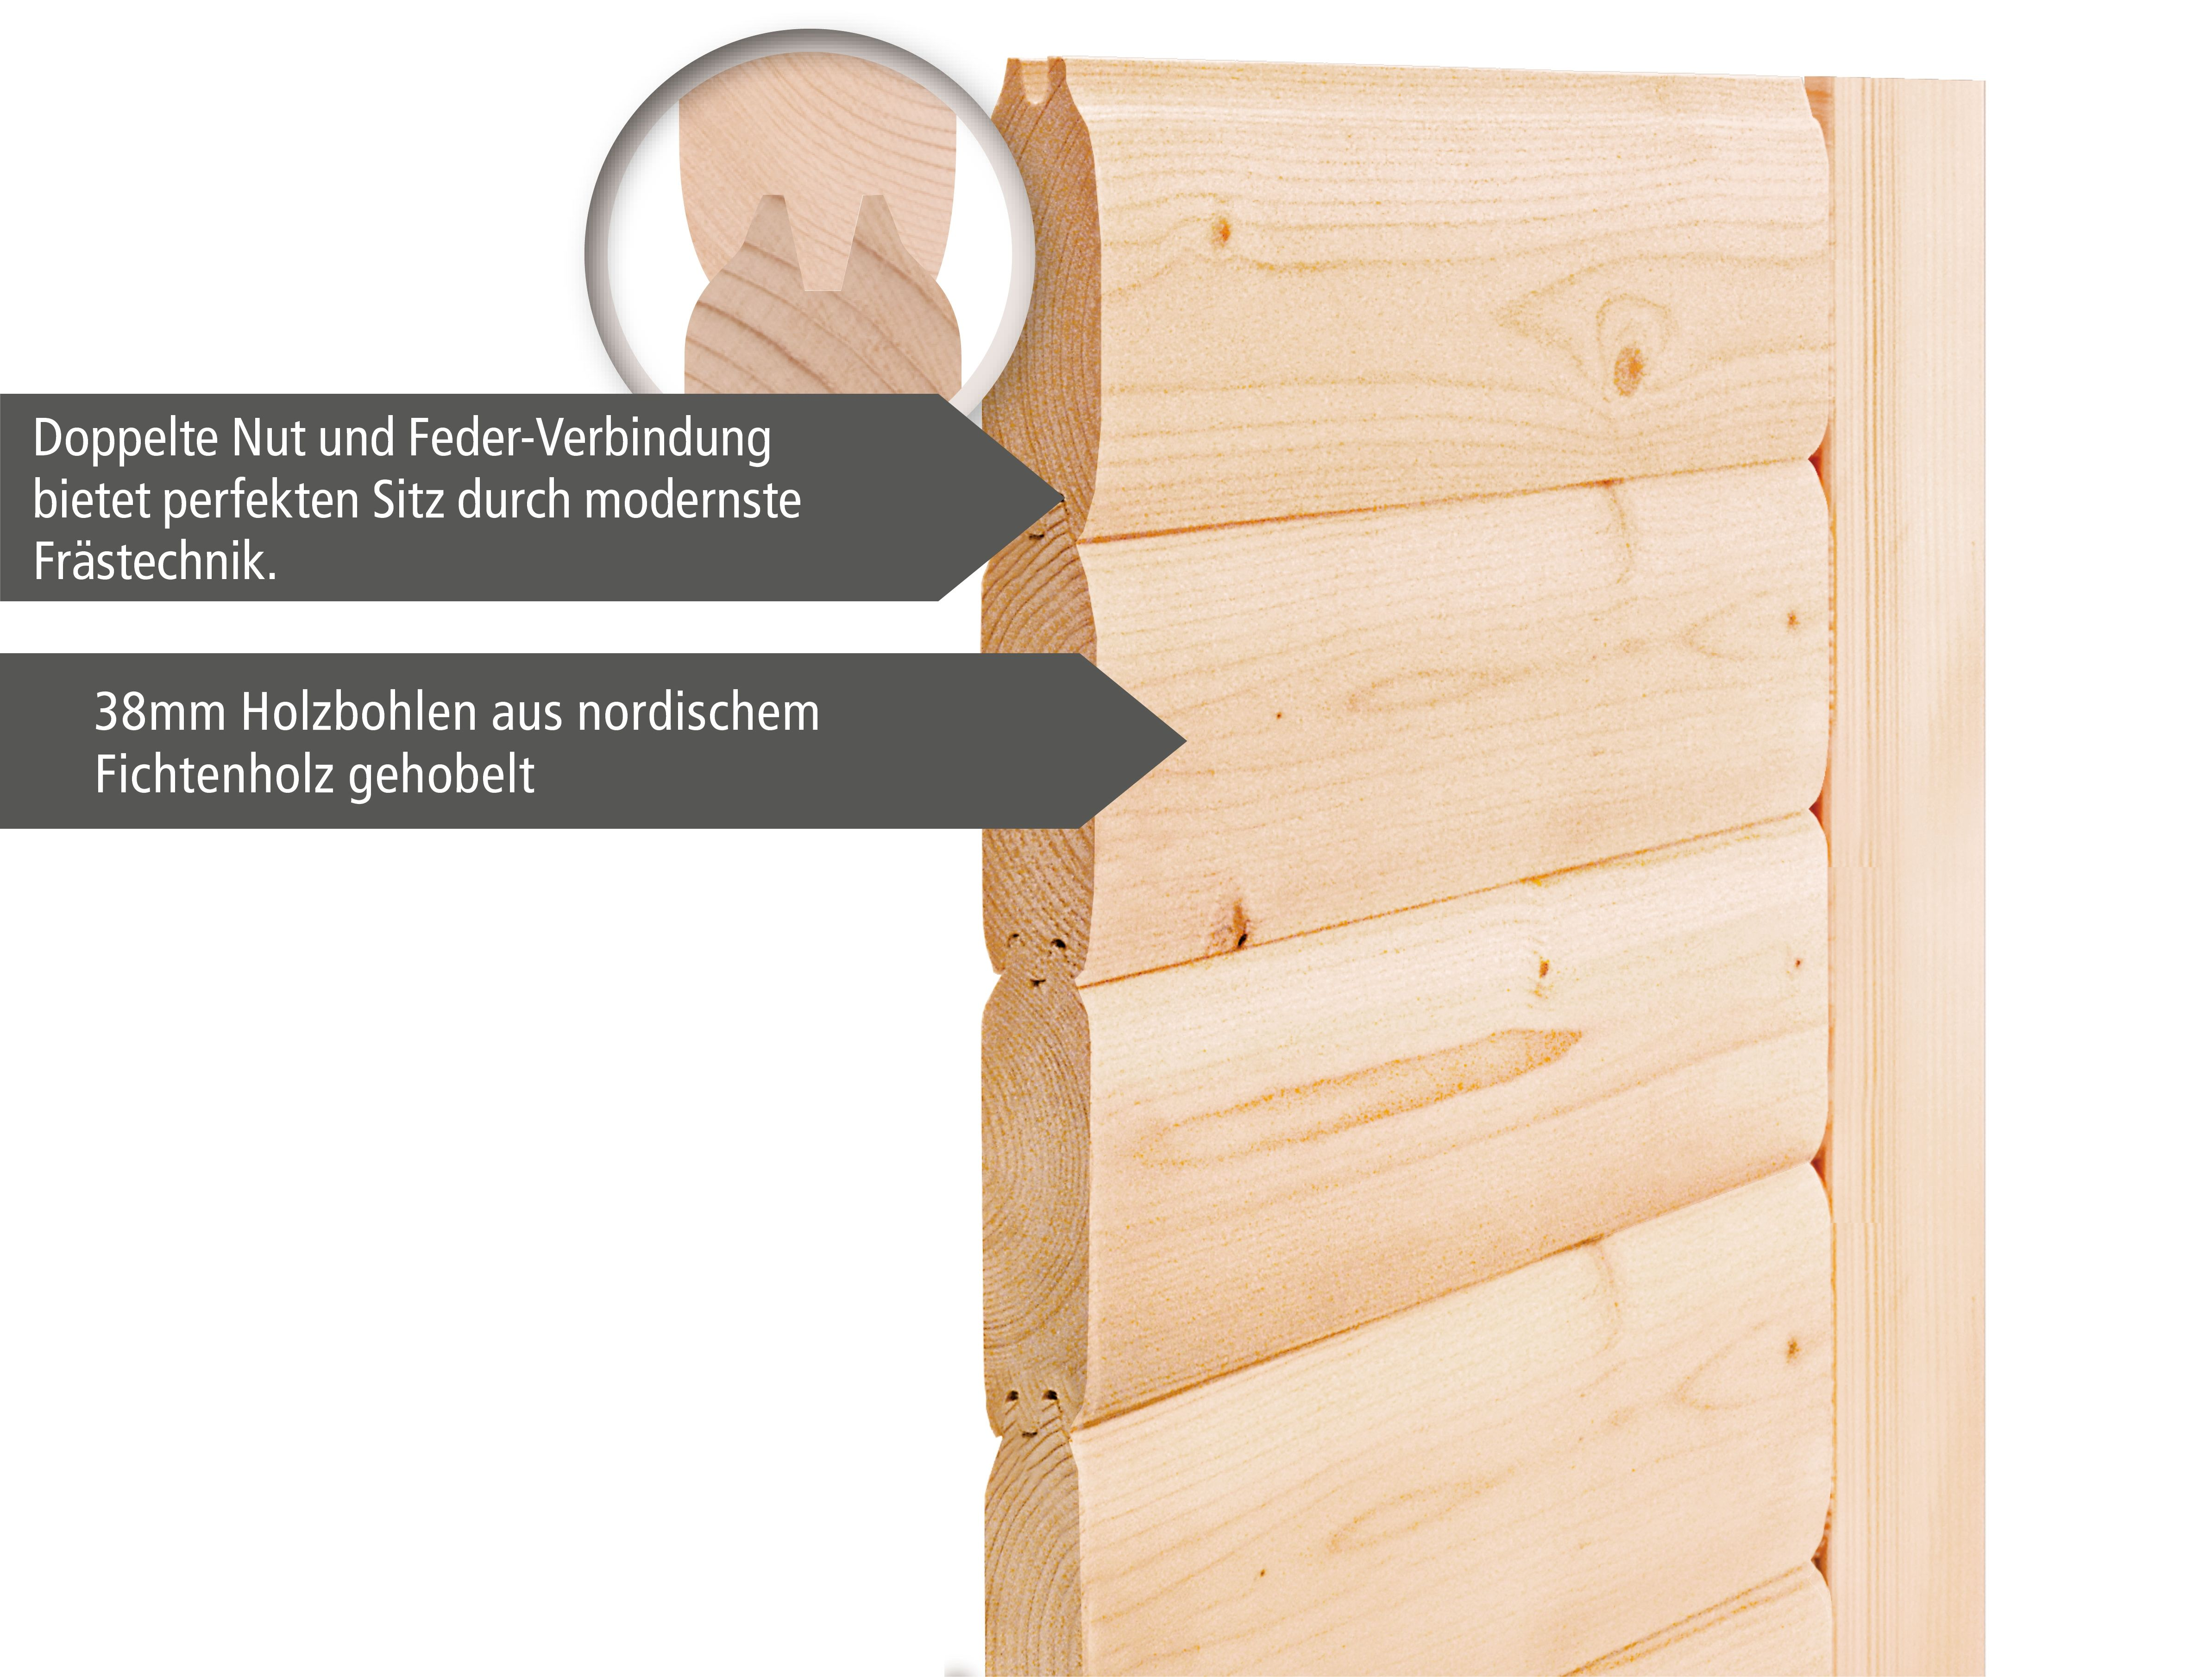 Woodfeeling Sauna Jada 38mm Saunaofen 9 kW intern Bild 4